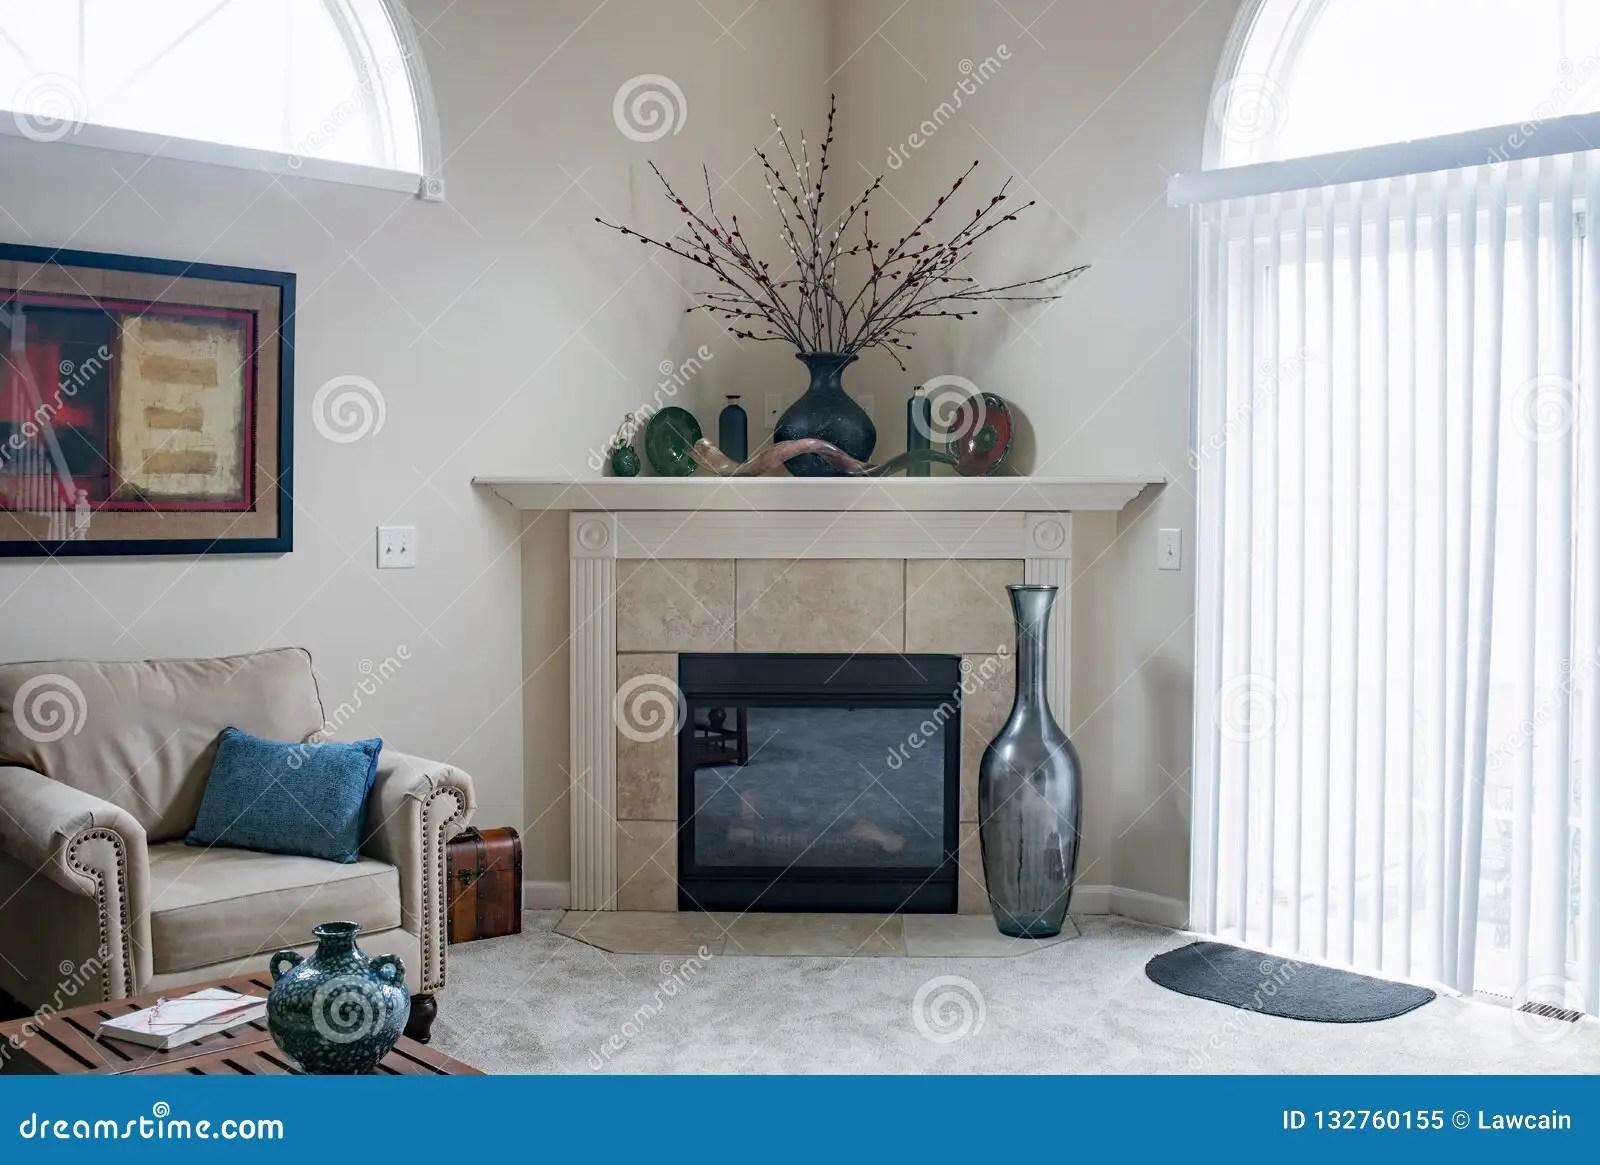 https www dreamstime com corner fireplace tan tile dayton ohio usa november contemporary living room carpeted floors image132760155